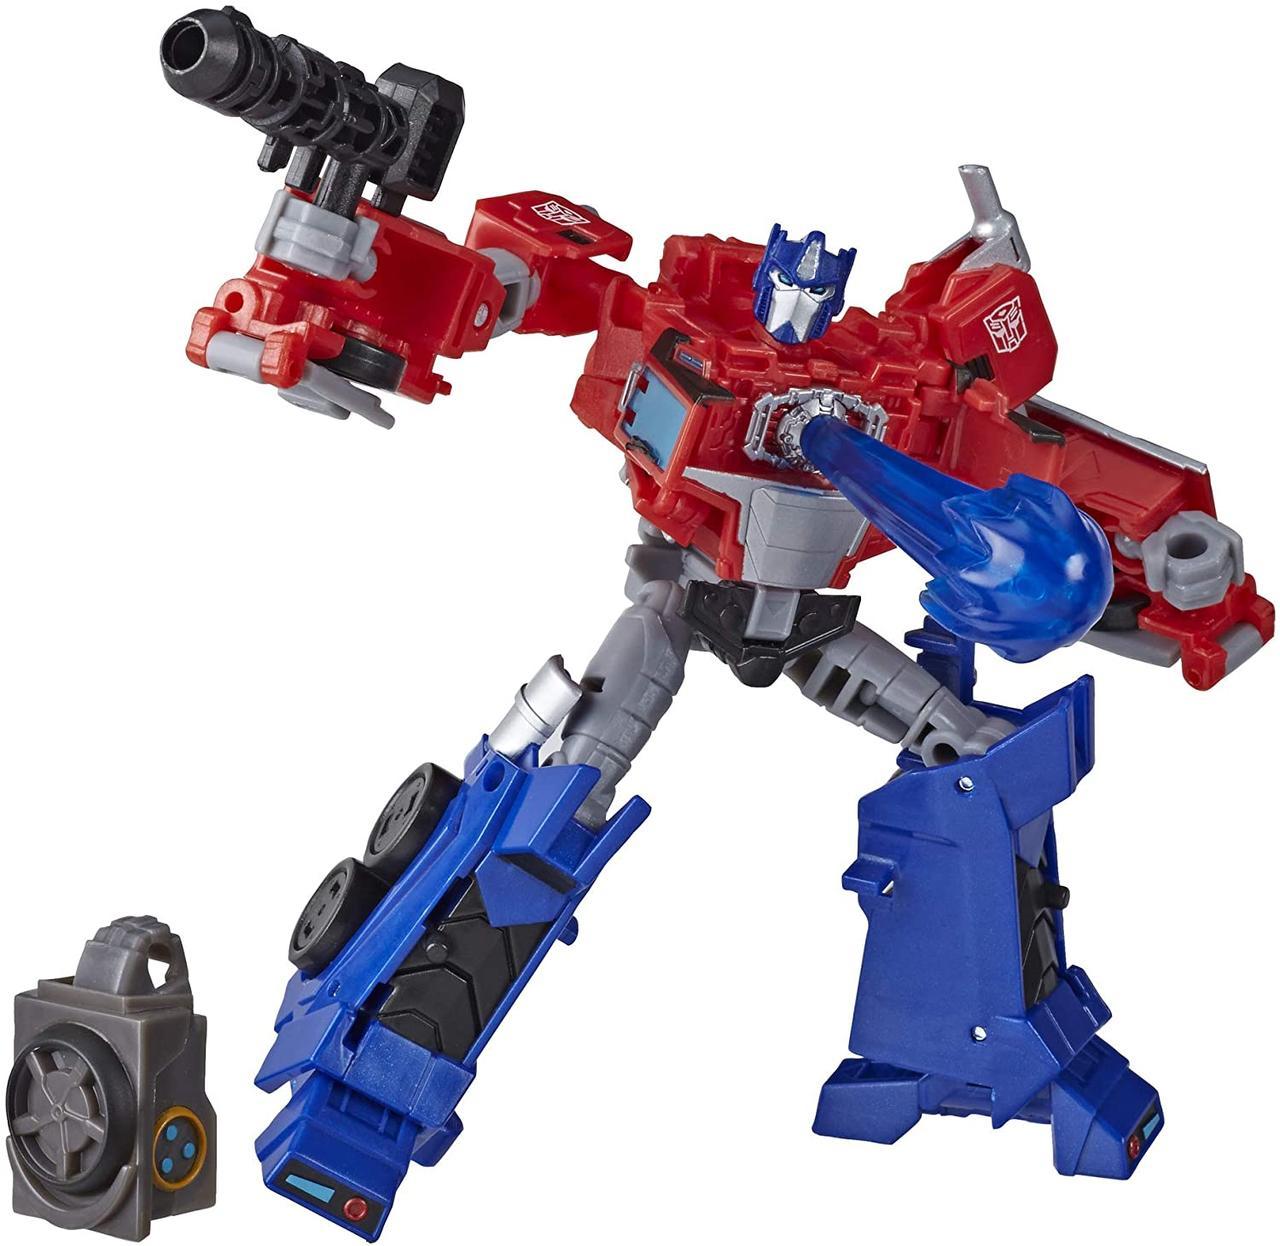 Робот-трансформер Hasbro, Оптімус Прайм, Кибервселенная, 13 см - Deluxe Class Optimus Prime, Build a Hero